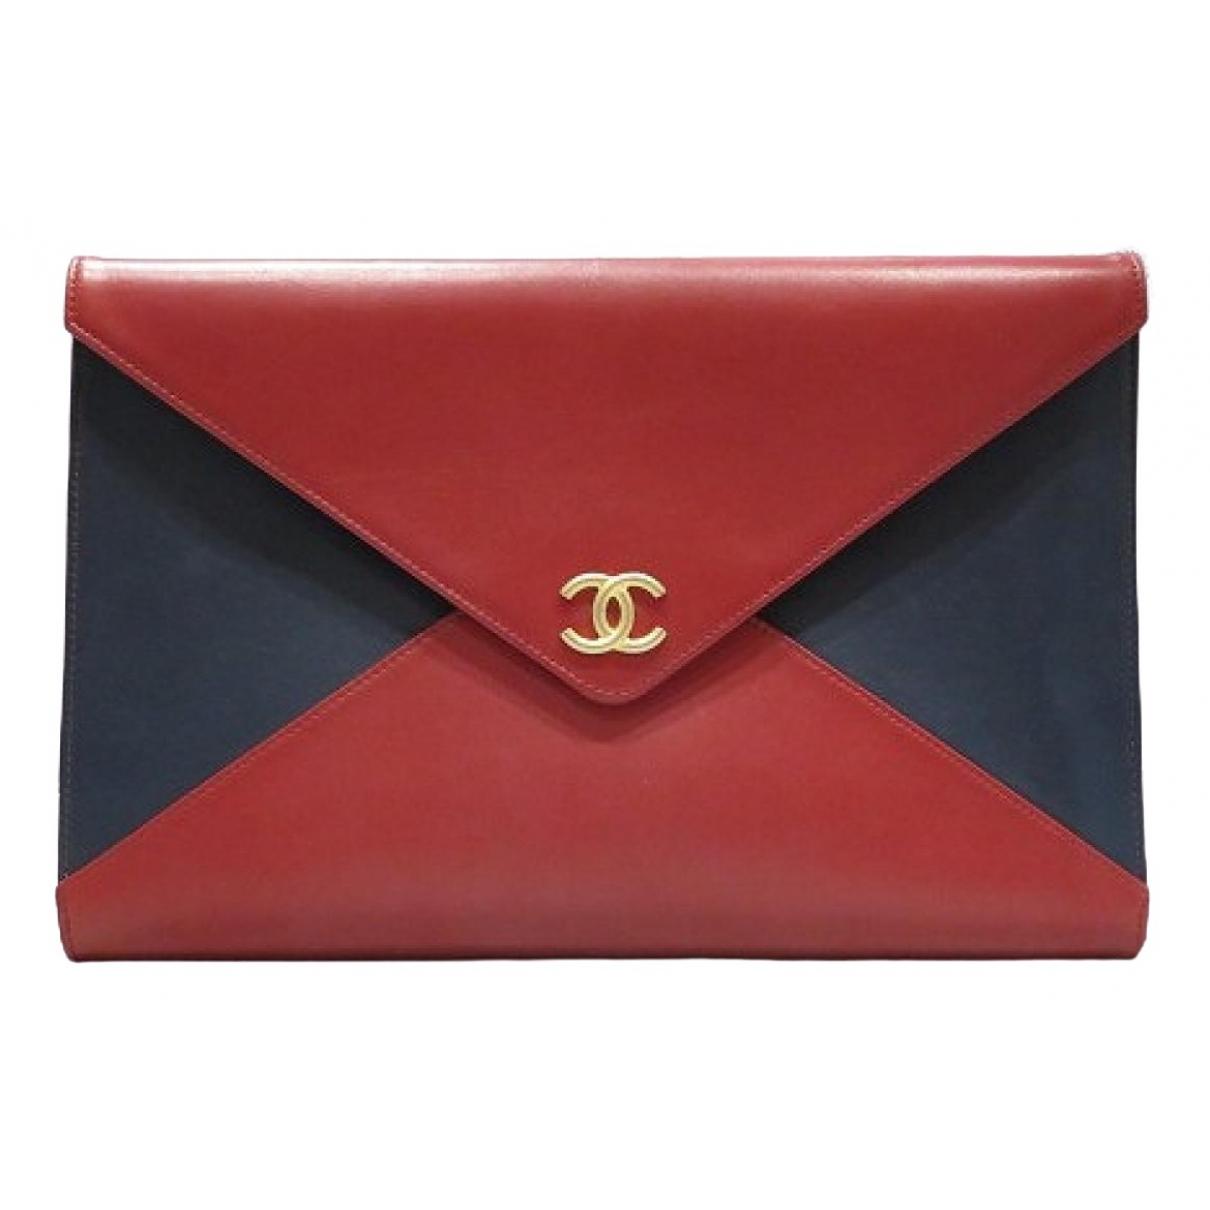 Chanel \N Multicolour Leather Clutch bag for Women \N